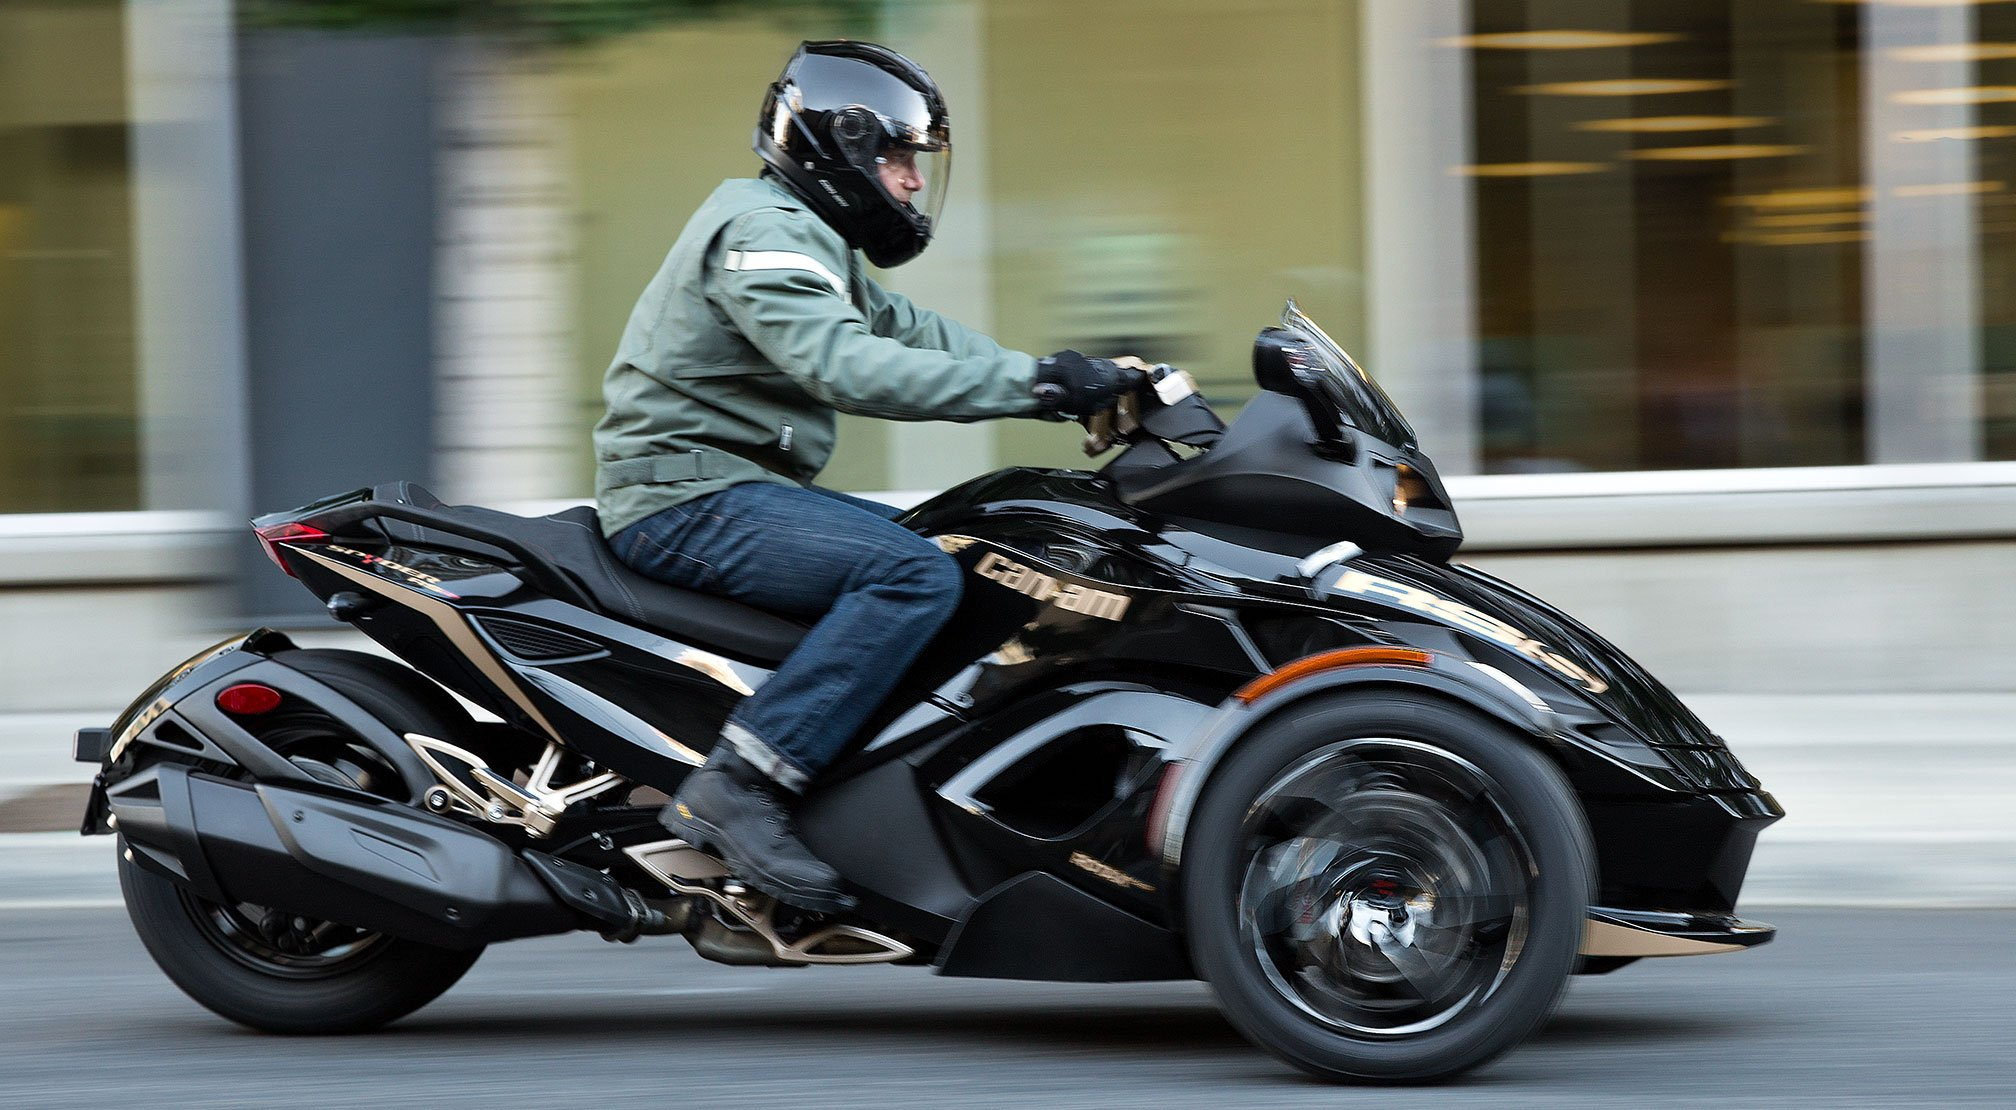 2016 can am spyder rss motorbike motorcycle bike e wallpaper 2016x1110 814514 wallpaperup. Black Bedroom Furniture Sets. Home Design Ideas